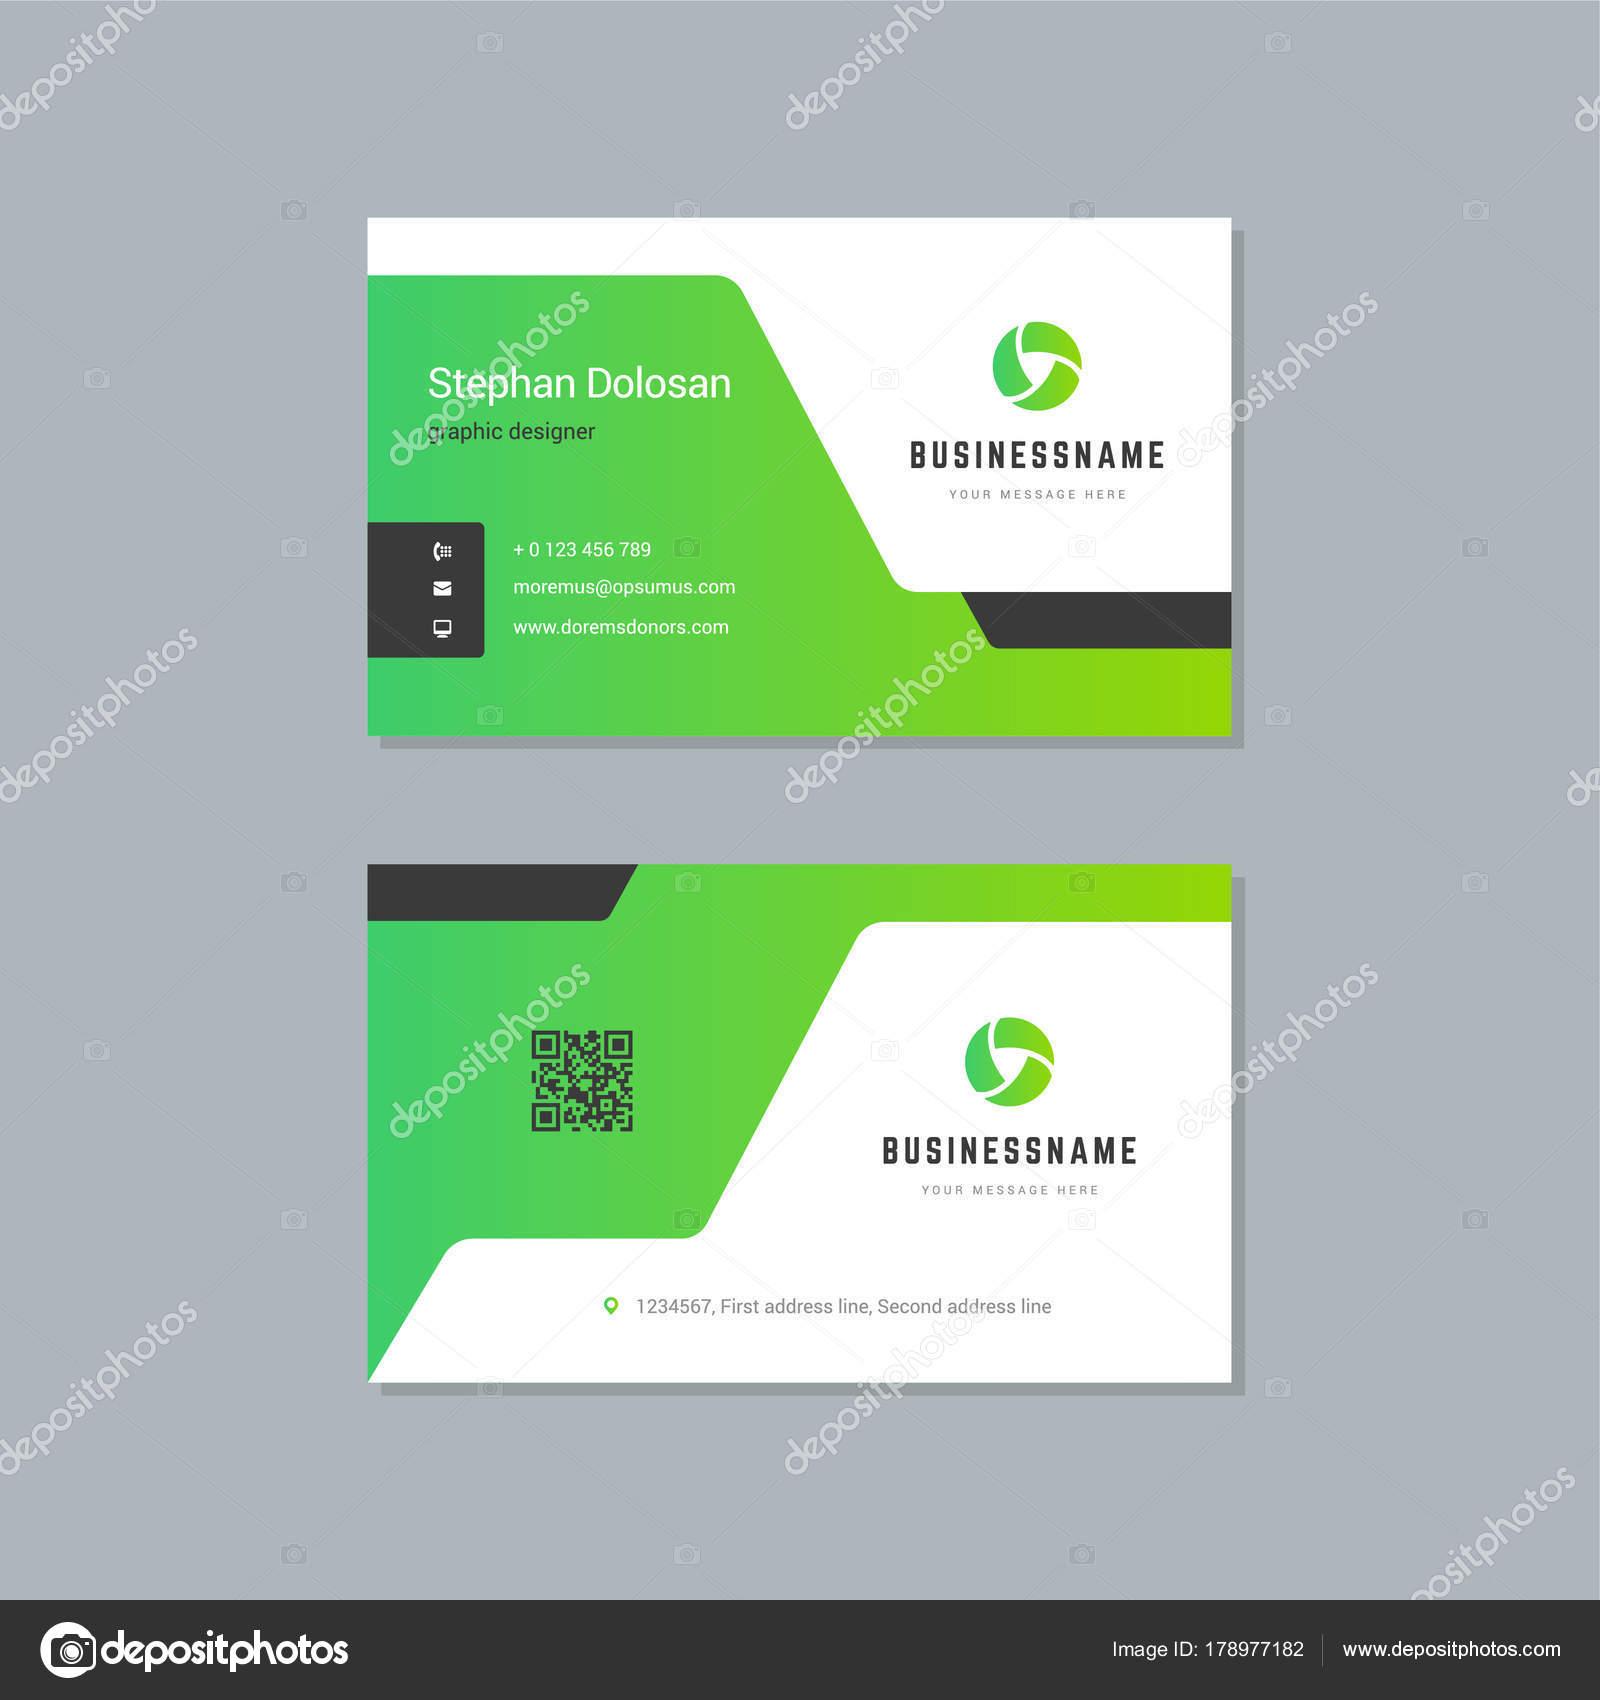 Business card design template abstract modern corporate branding ...